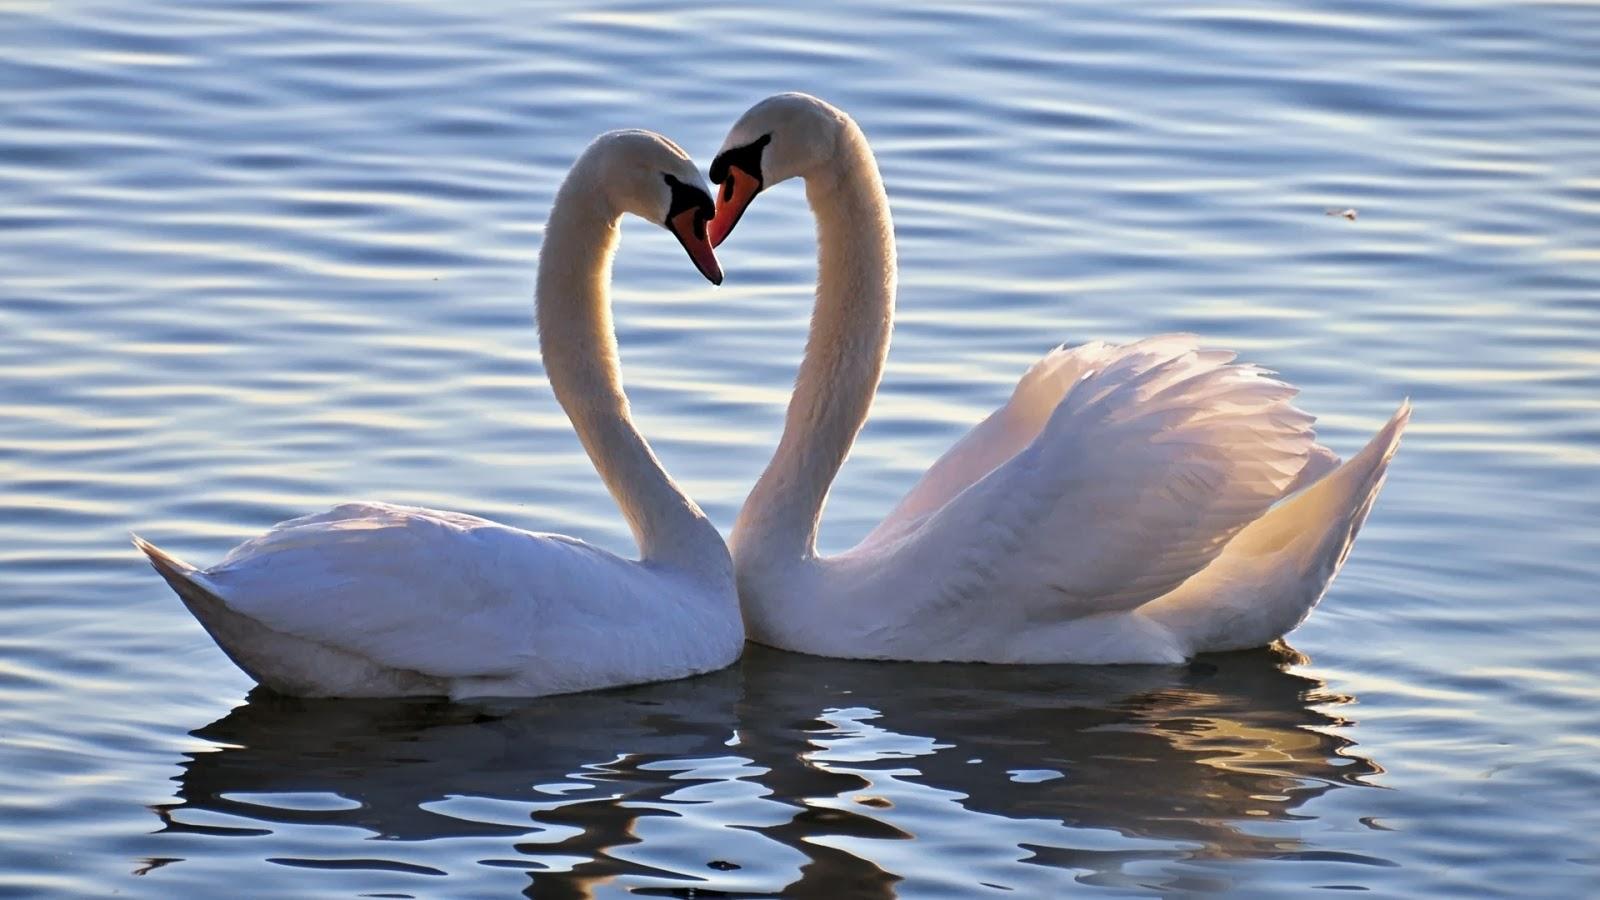 Cool photos swan love desktop wallpaper - Swan wallpapers for desktop ...